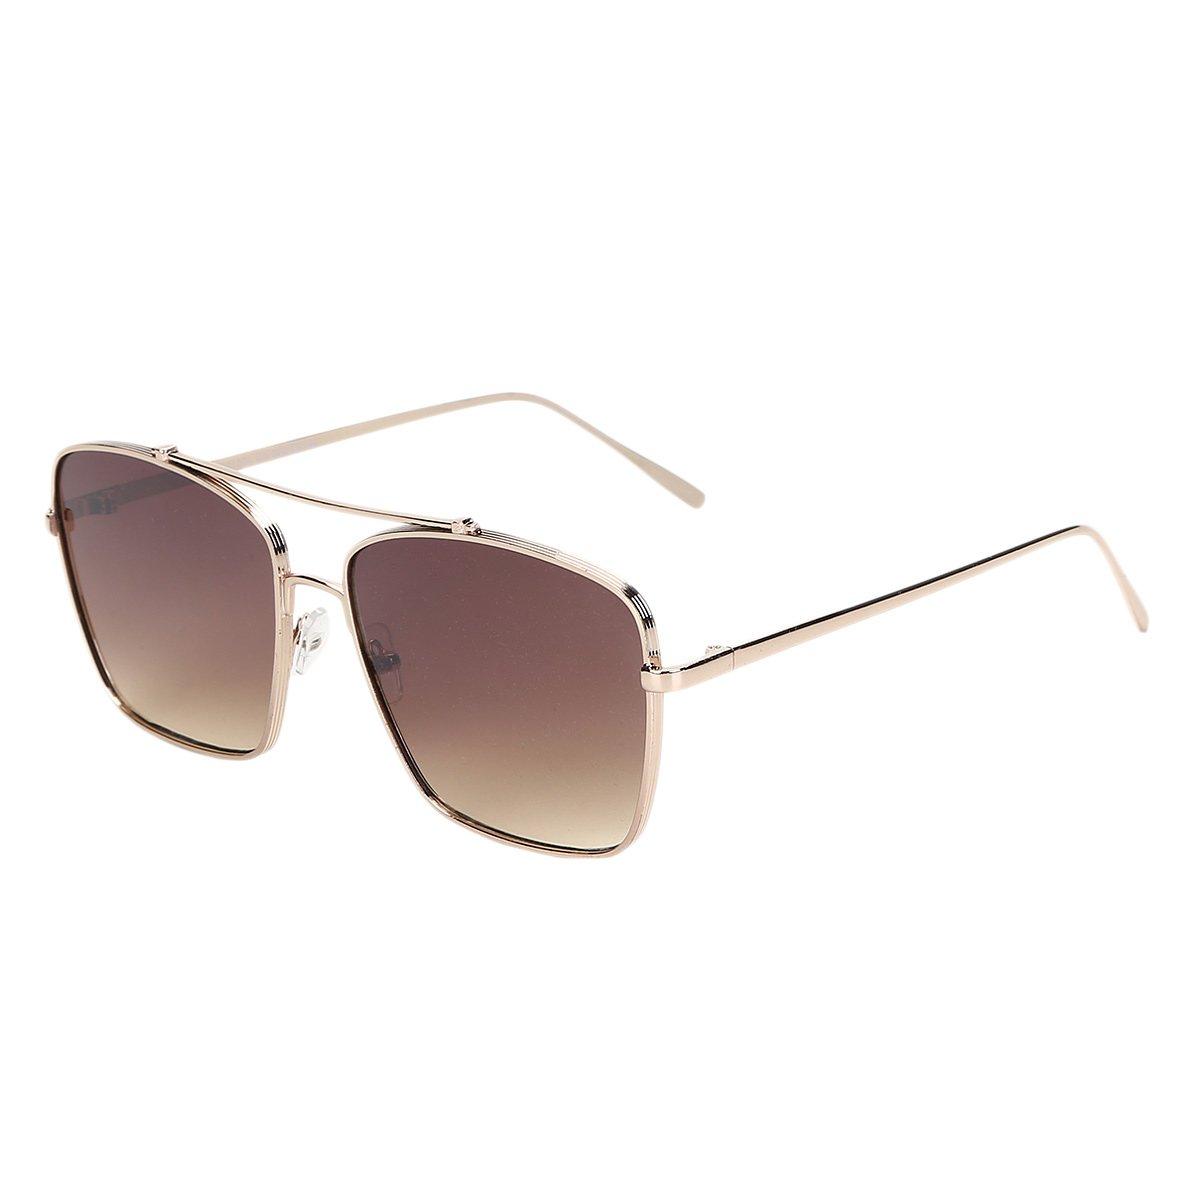 9b7f5b3ab1626 Óculos de Sol King One A57 Masculino - Marrom - Compre Agora